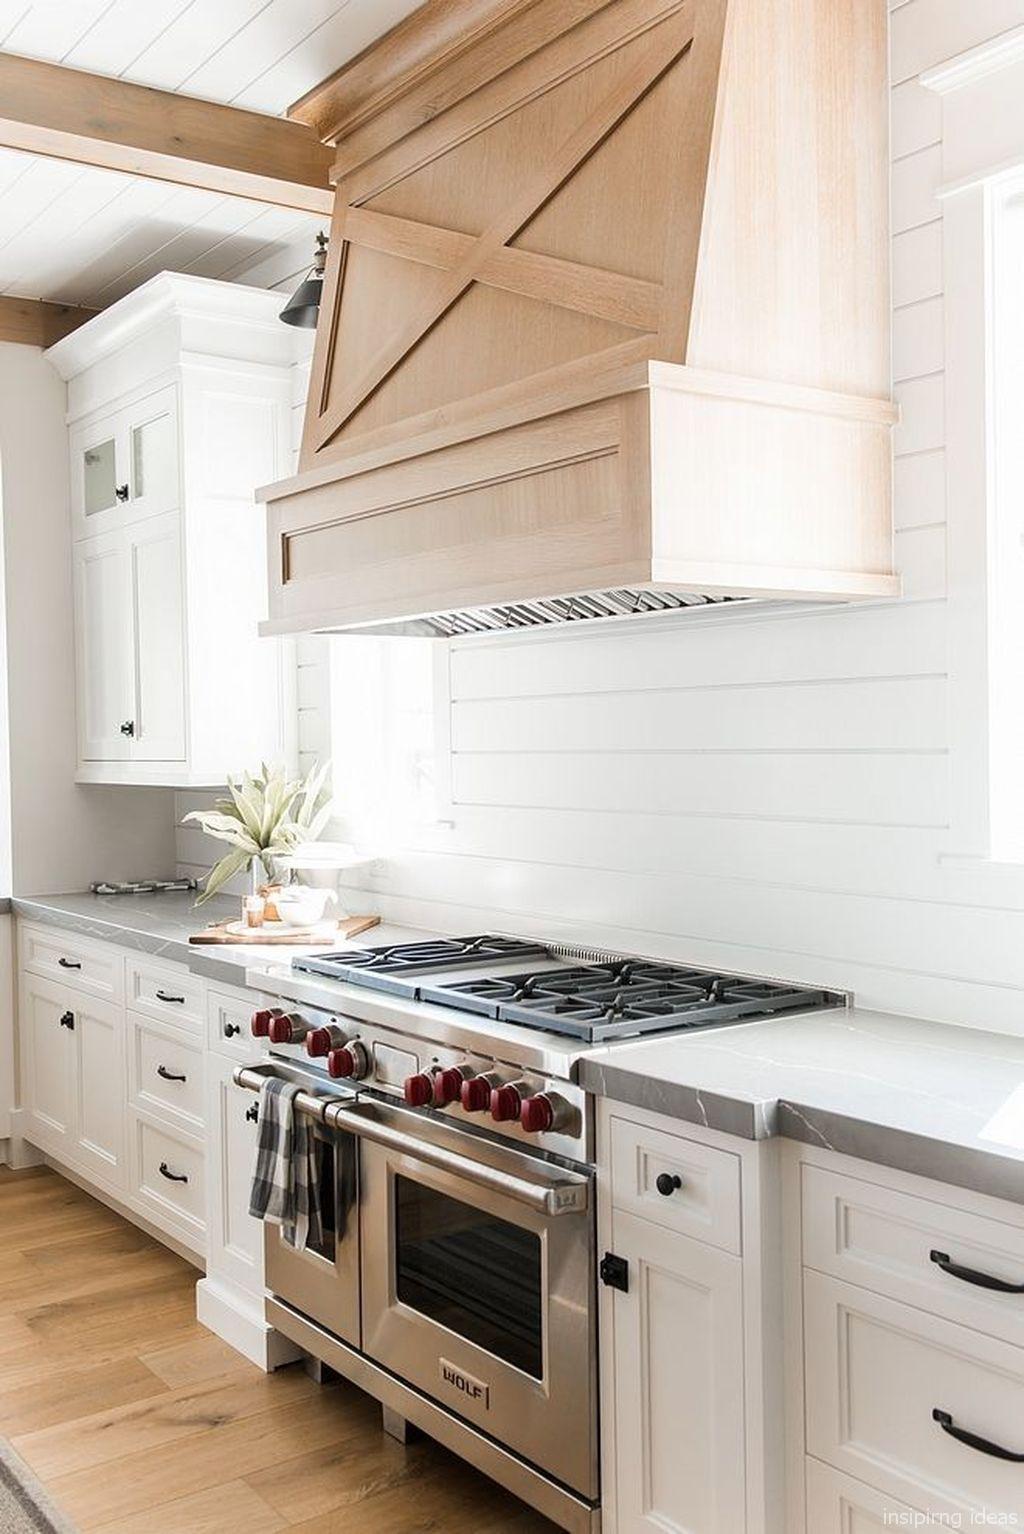 17 Awesome Modern Farmhouse Kitchen Backspash Ideas